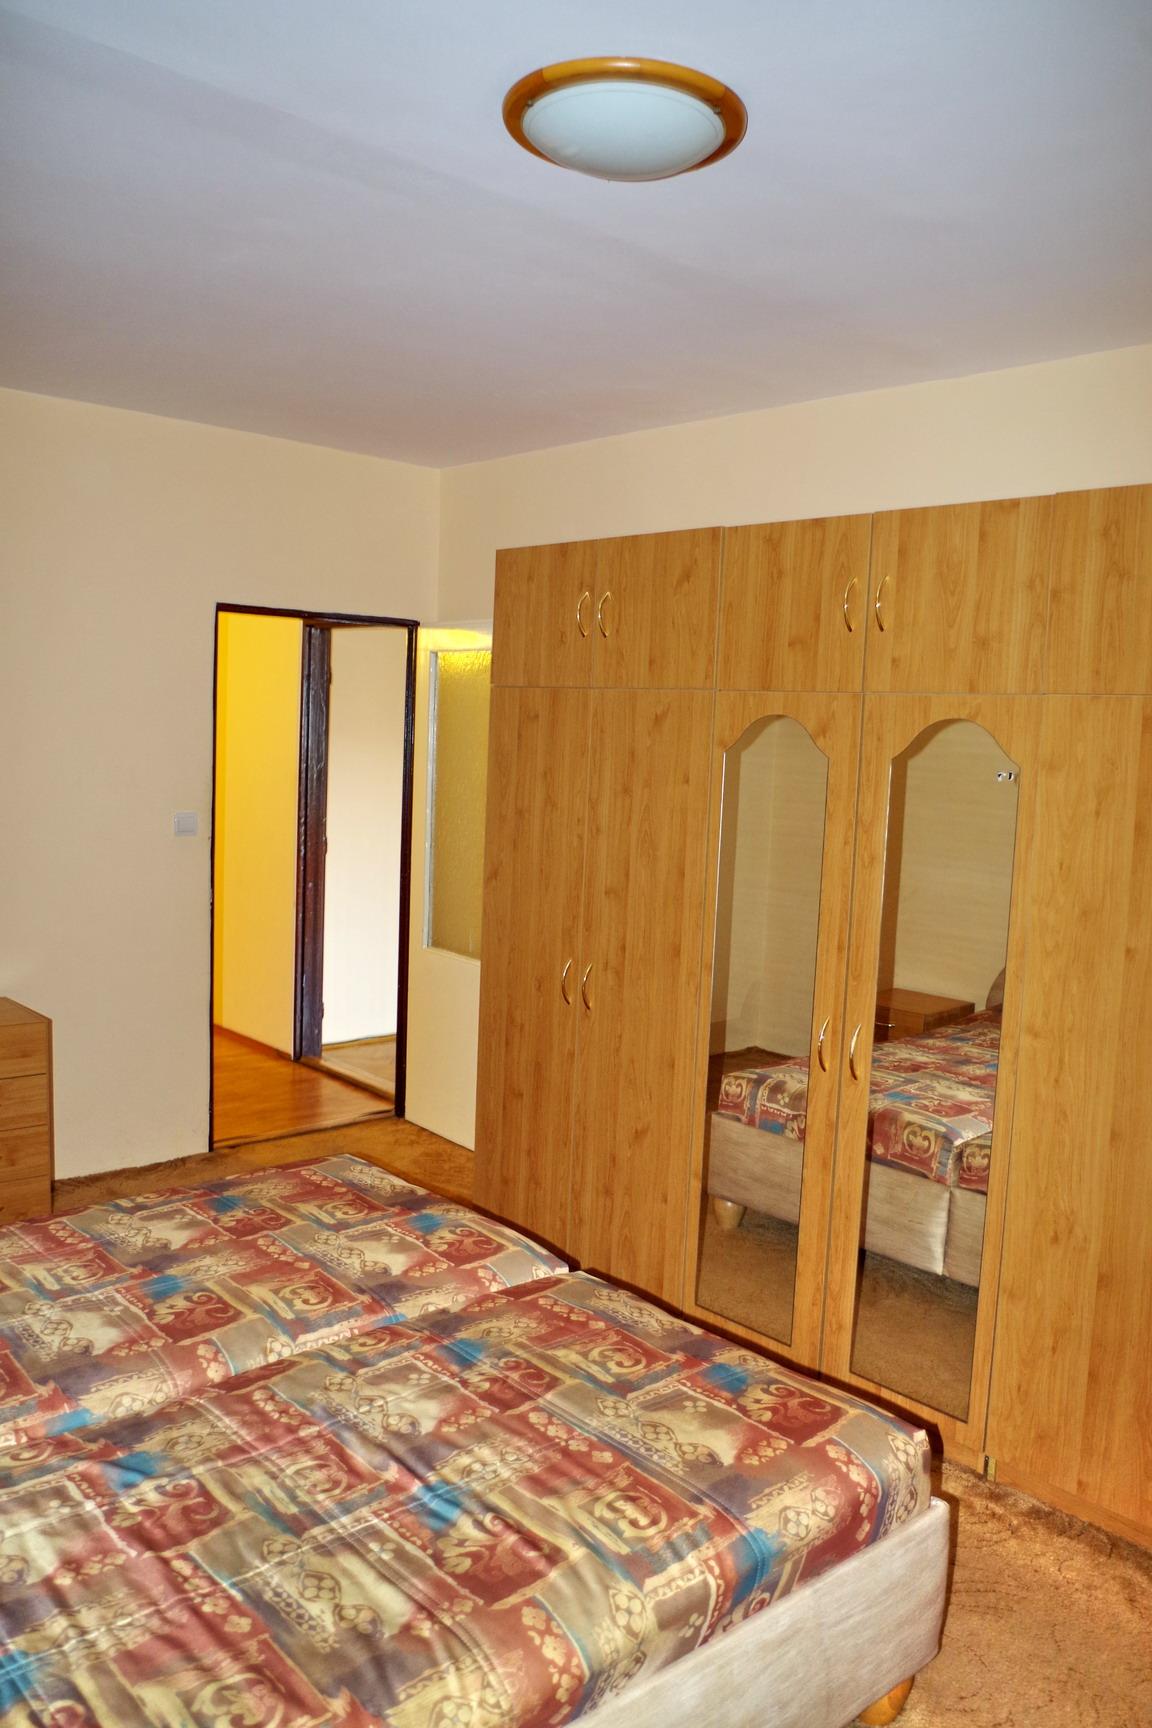 2-izbový byt v dobrej lokalite v NZ – Nová cena!